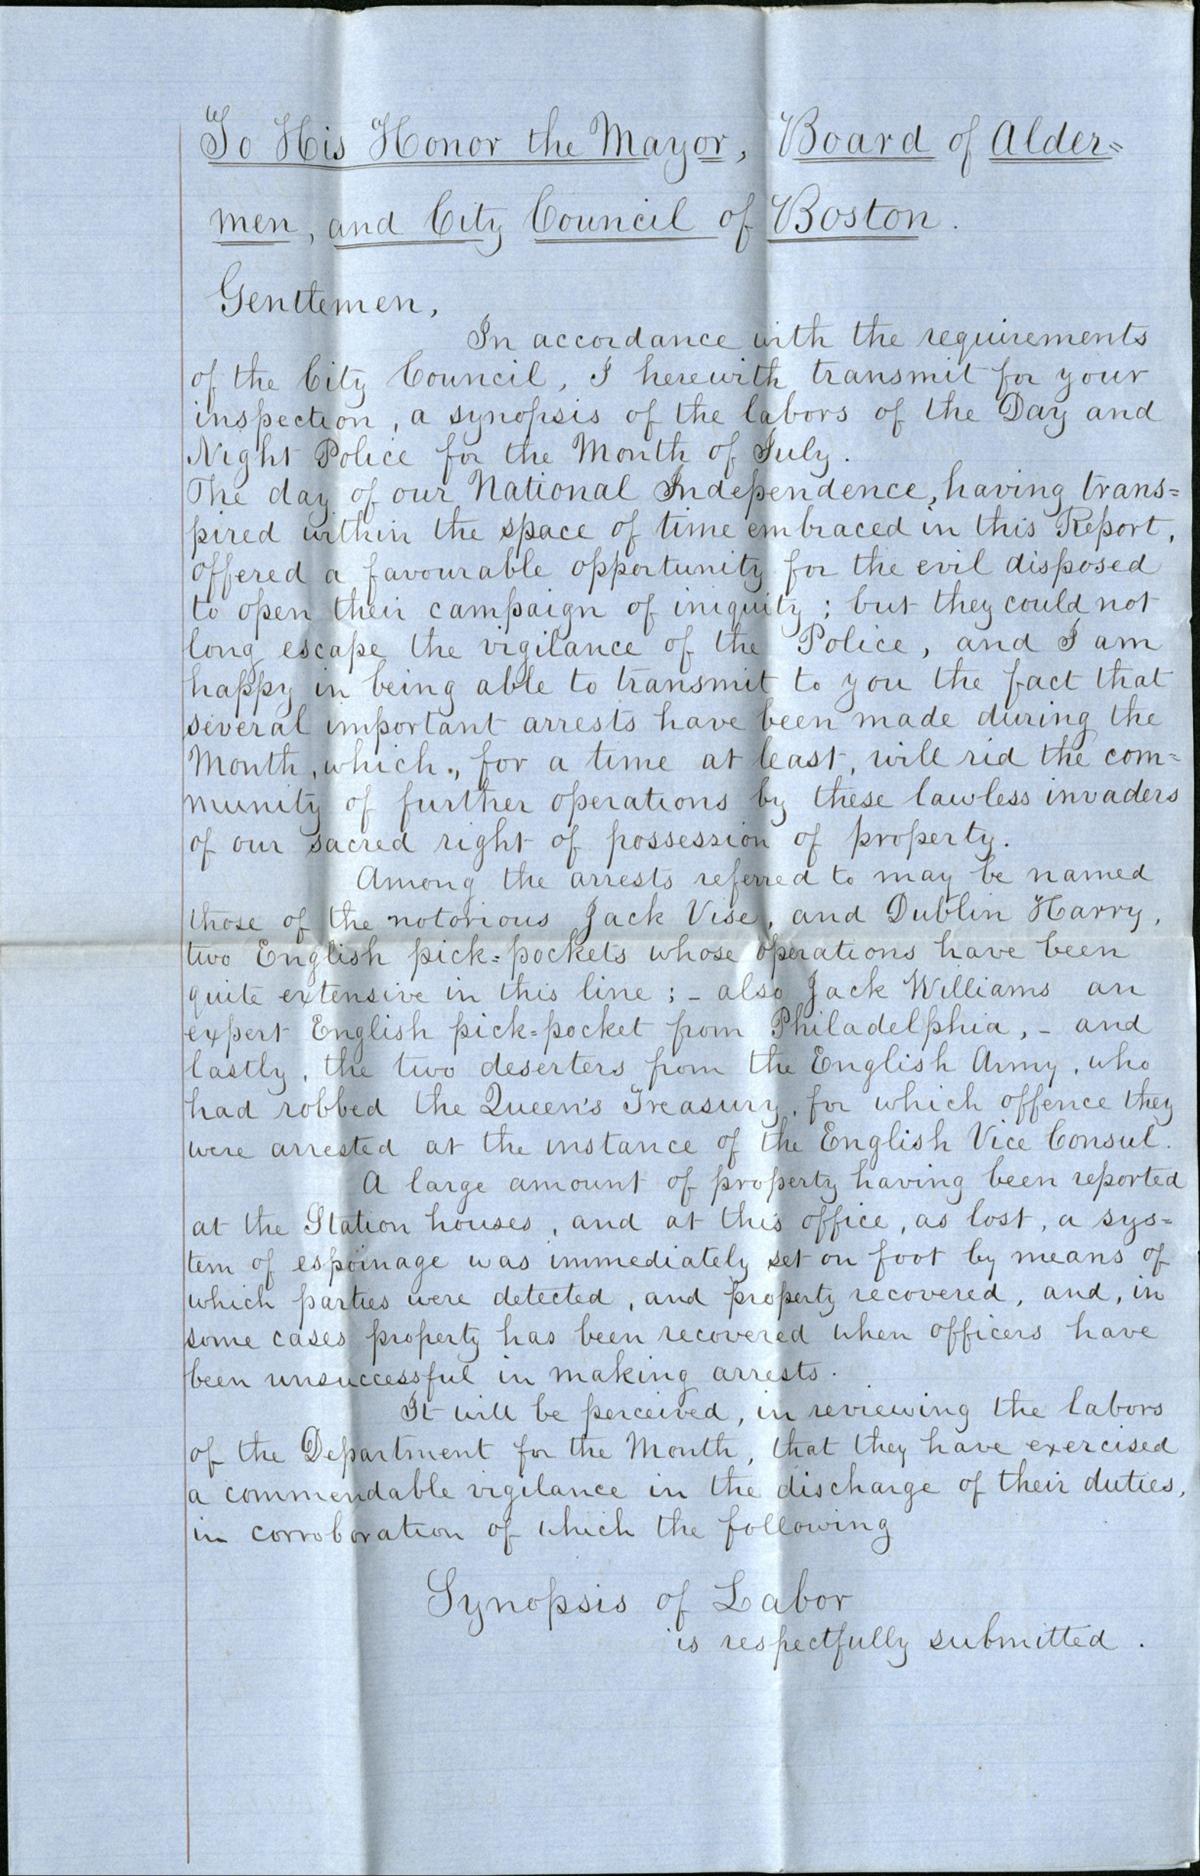 Letter via City of Boston Archives/Public domain